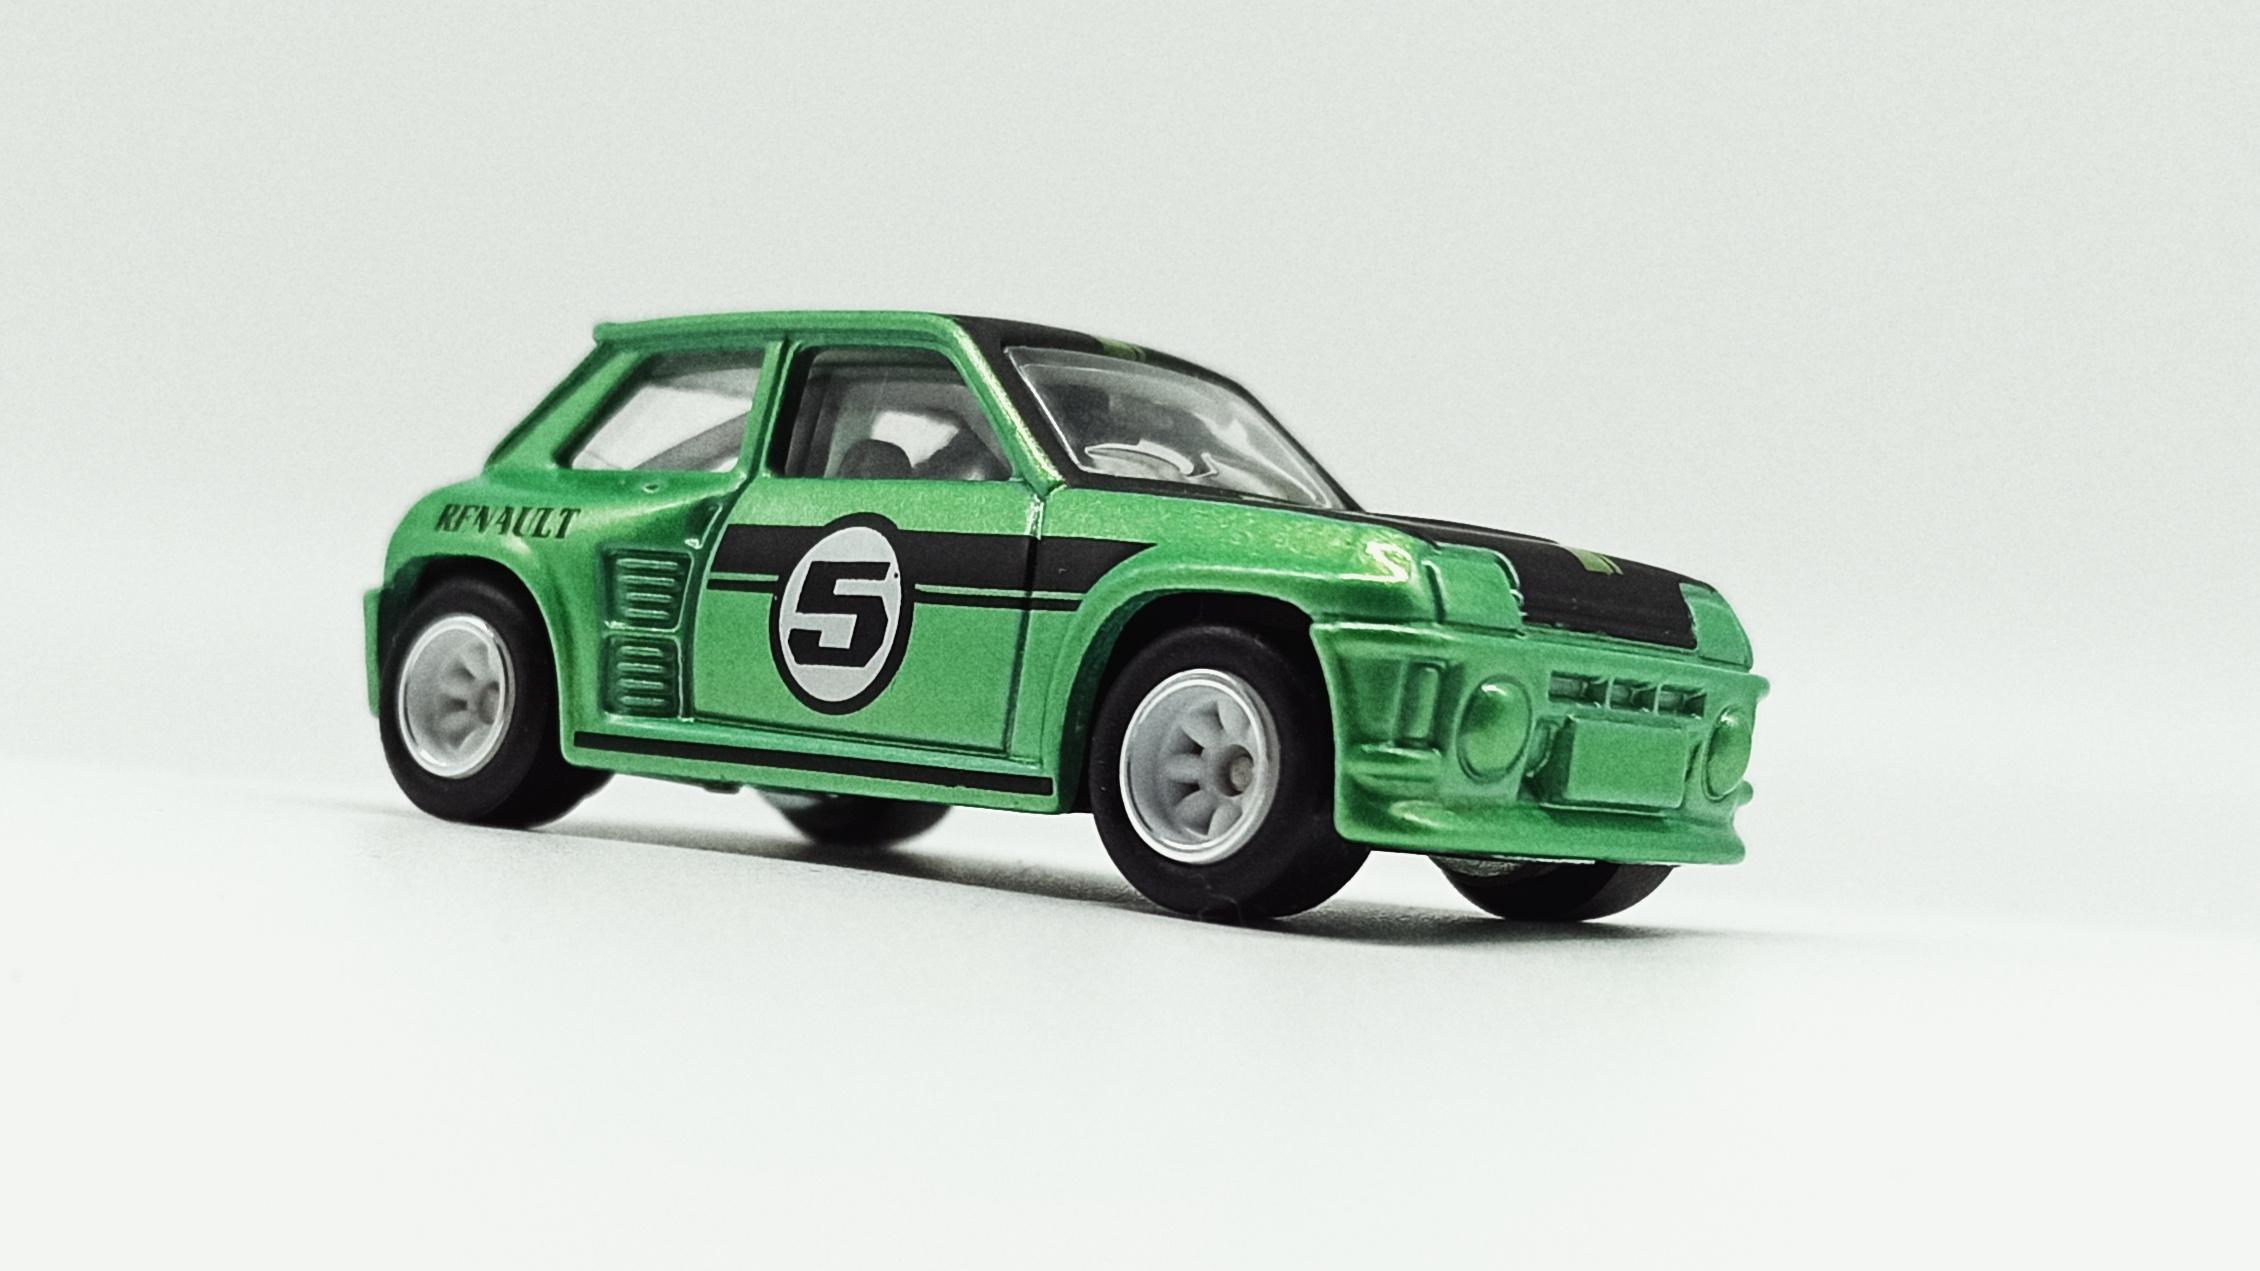 Hot Wheels Renault 5 Turbo (X8244) 2013 Boulevard metalflake green front angle